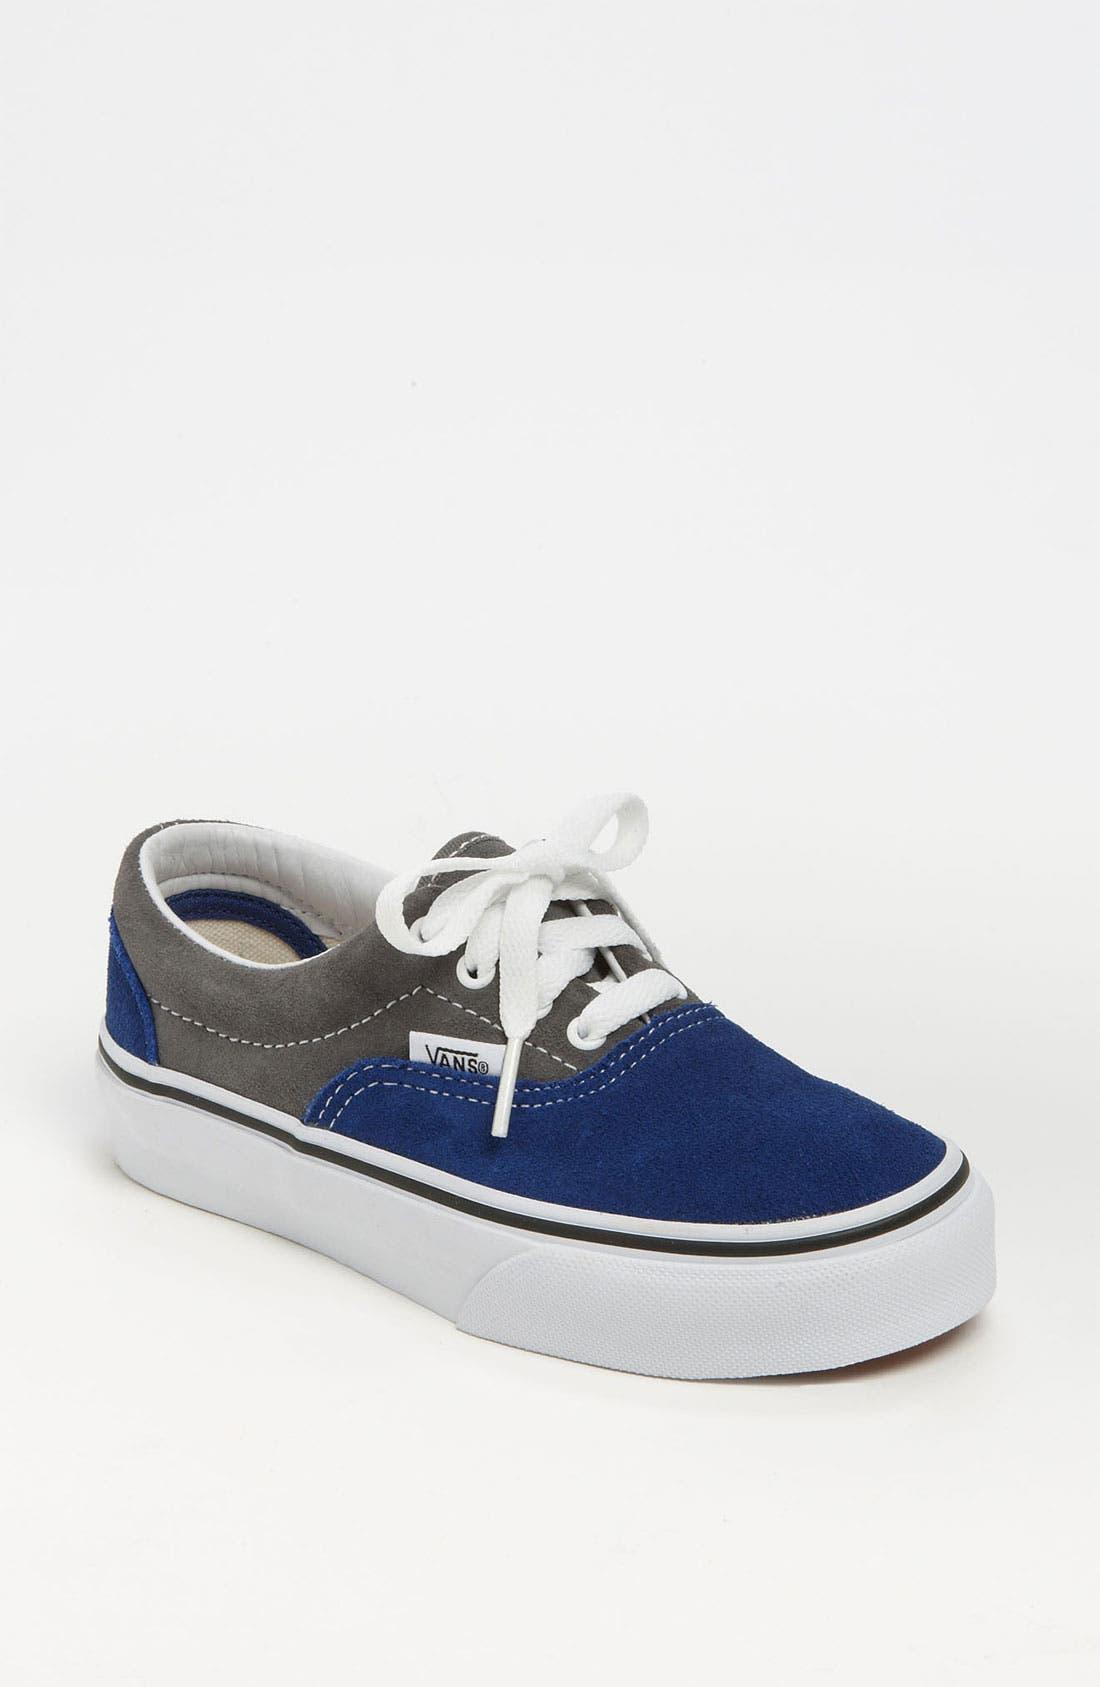 Main Image - Vans 'Era' Sneaker (Toddler, Little Kid & Big Kid)